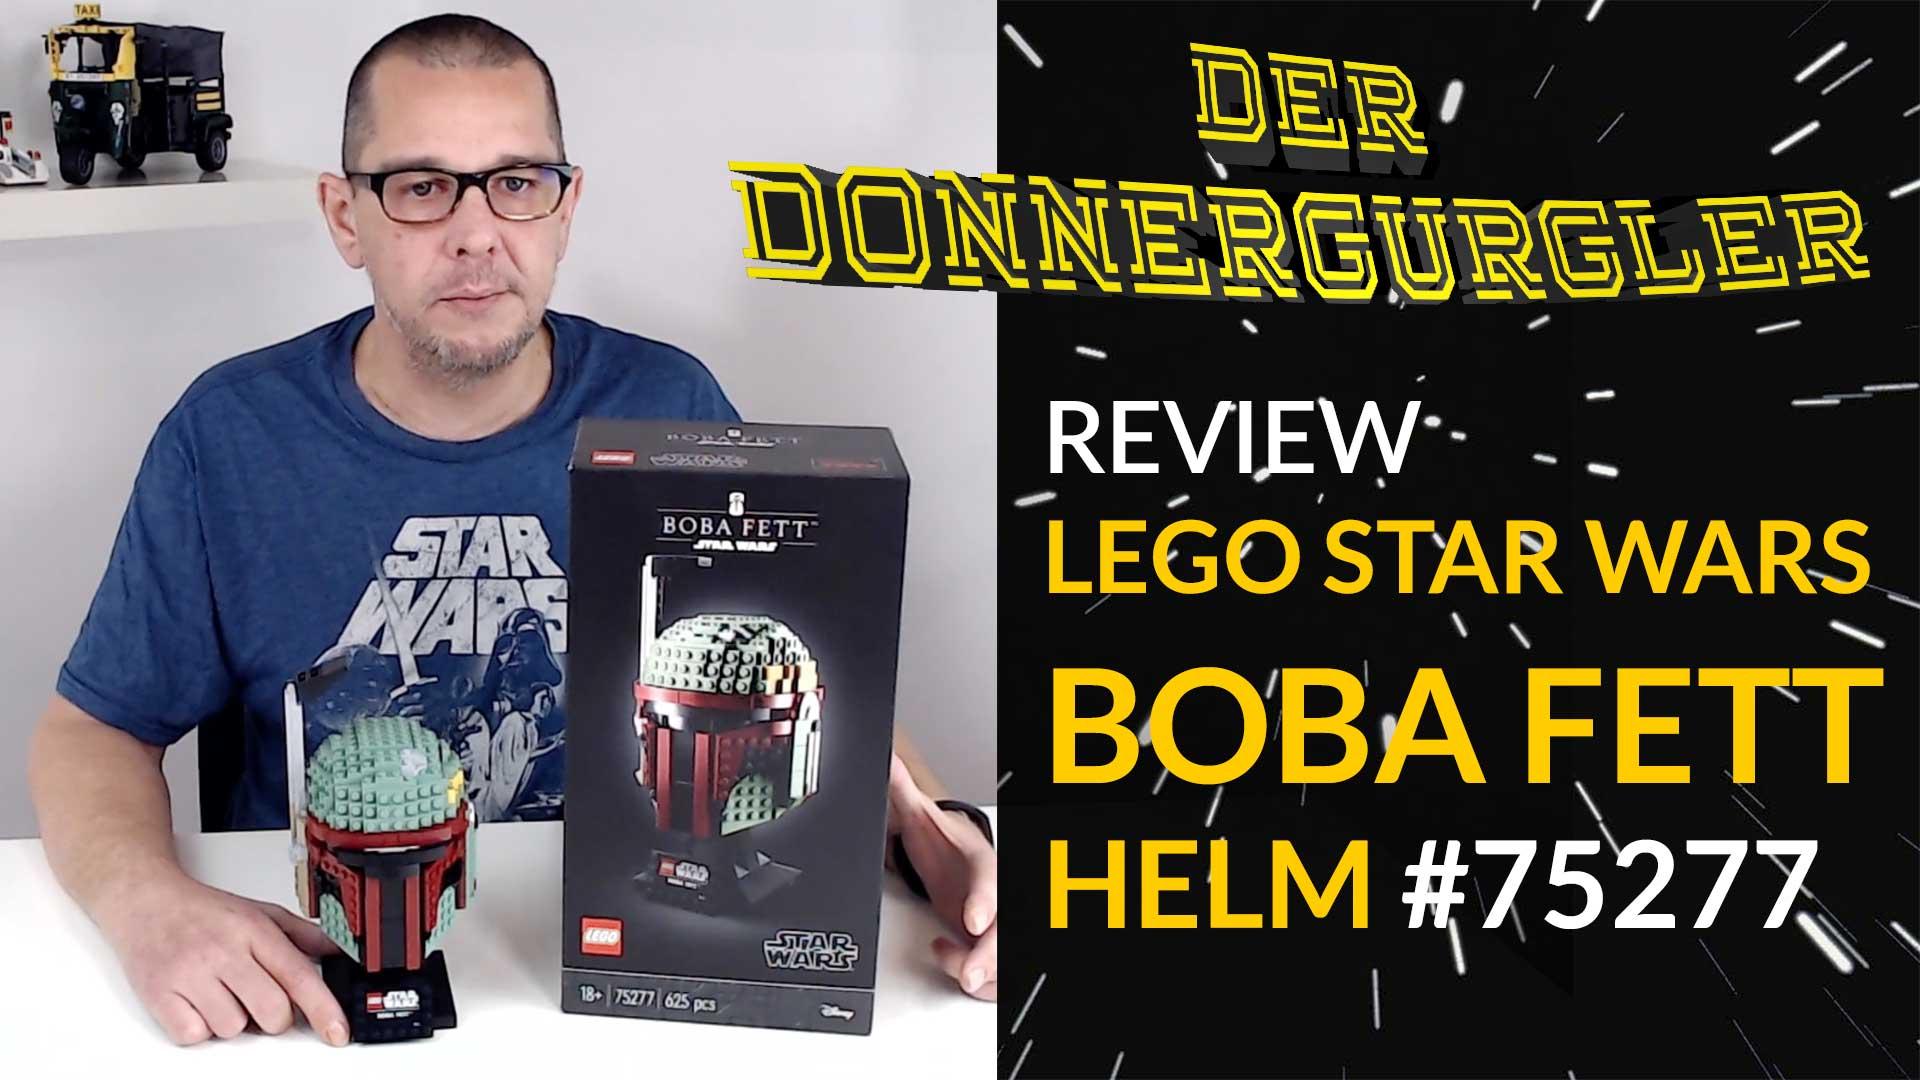 Lego Star Wars Boba Fett Helm #75277 Review - Rest in Peace Mr. Jamie Bullock!